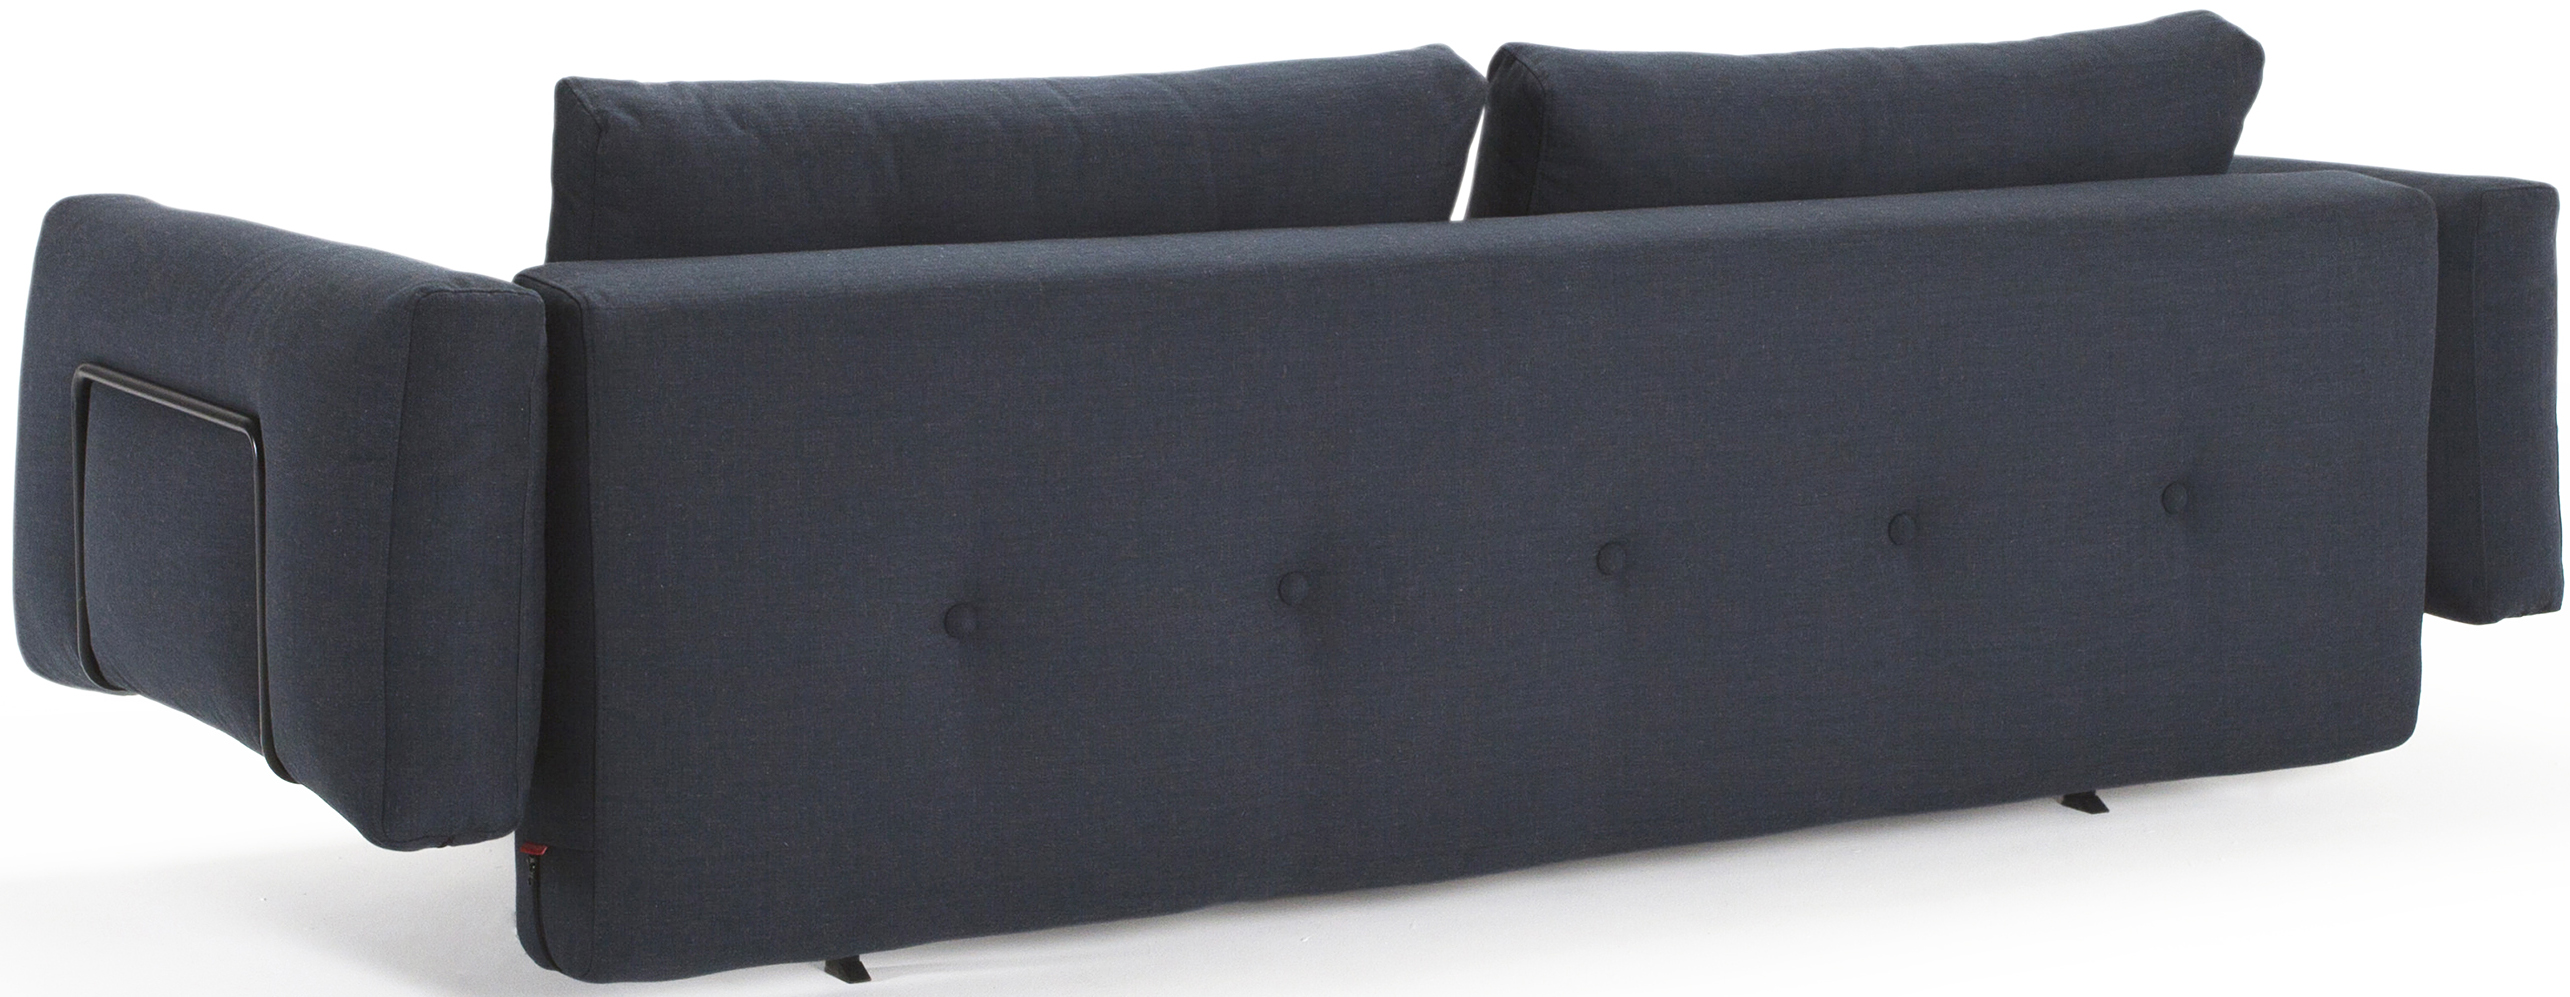 innovation living recast plus sofa bed